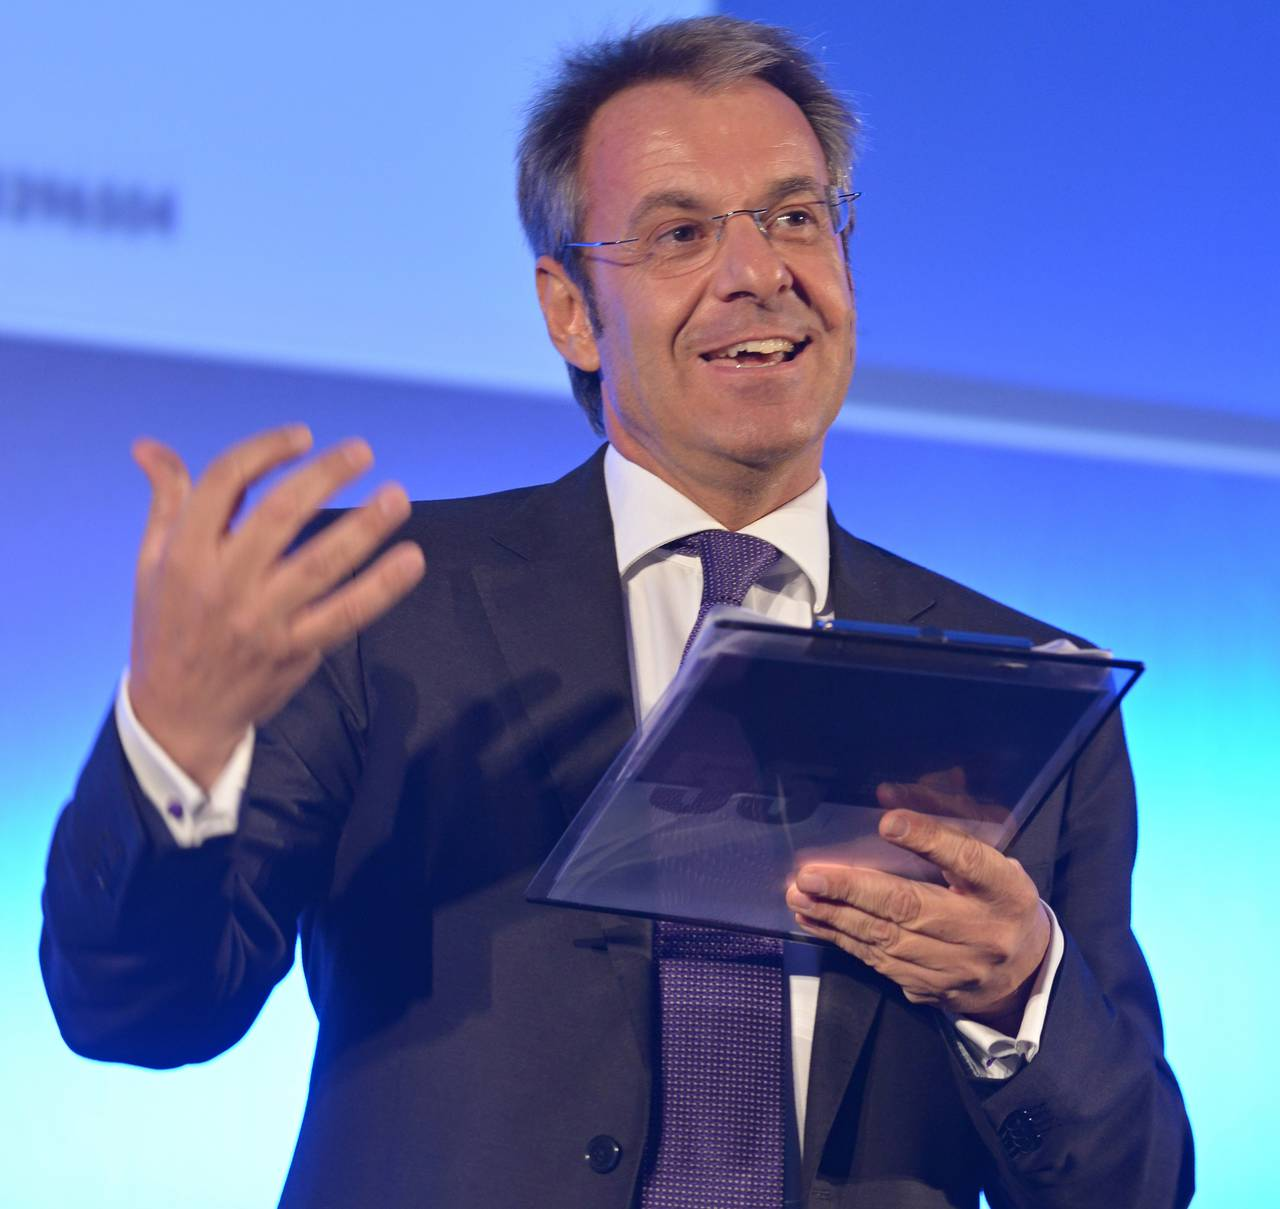 Giorgio Santambrogio